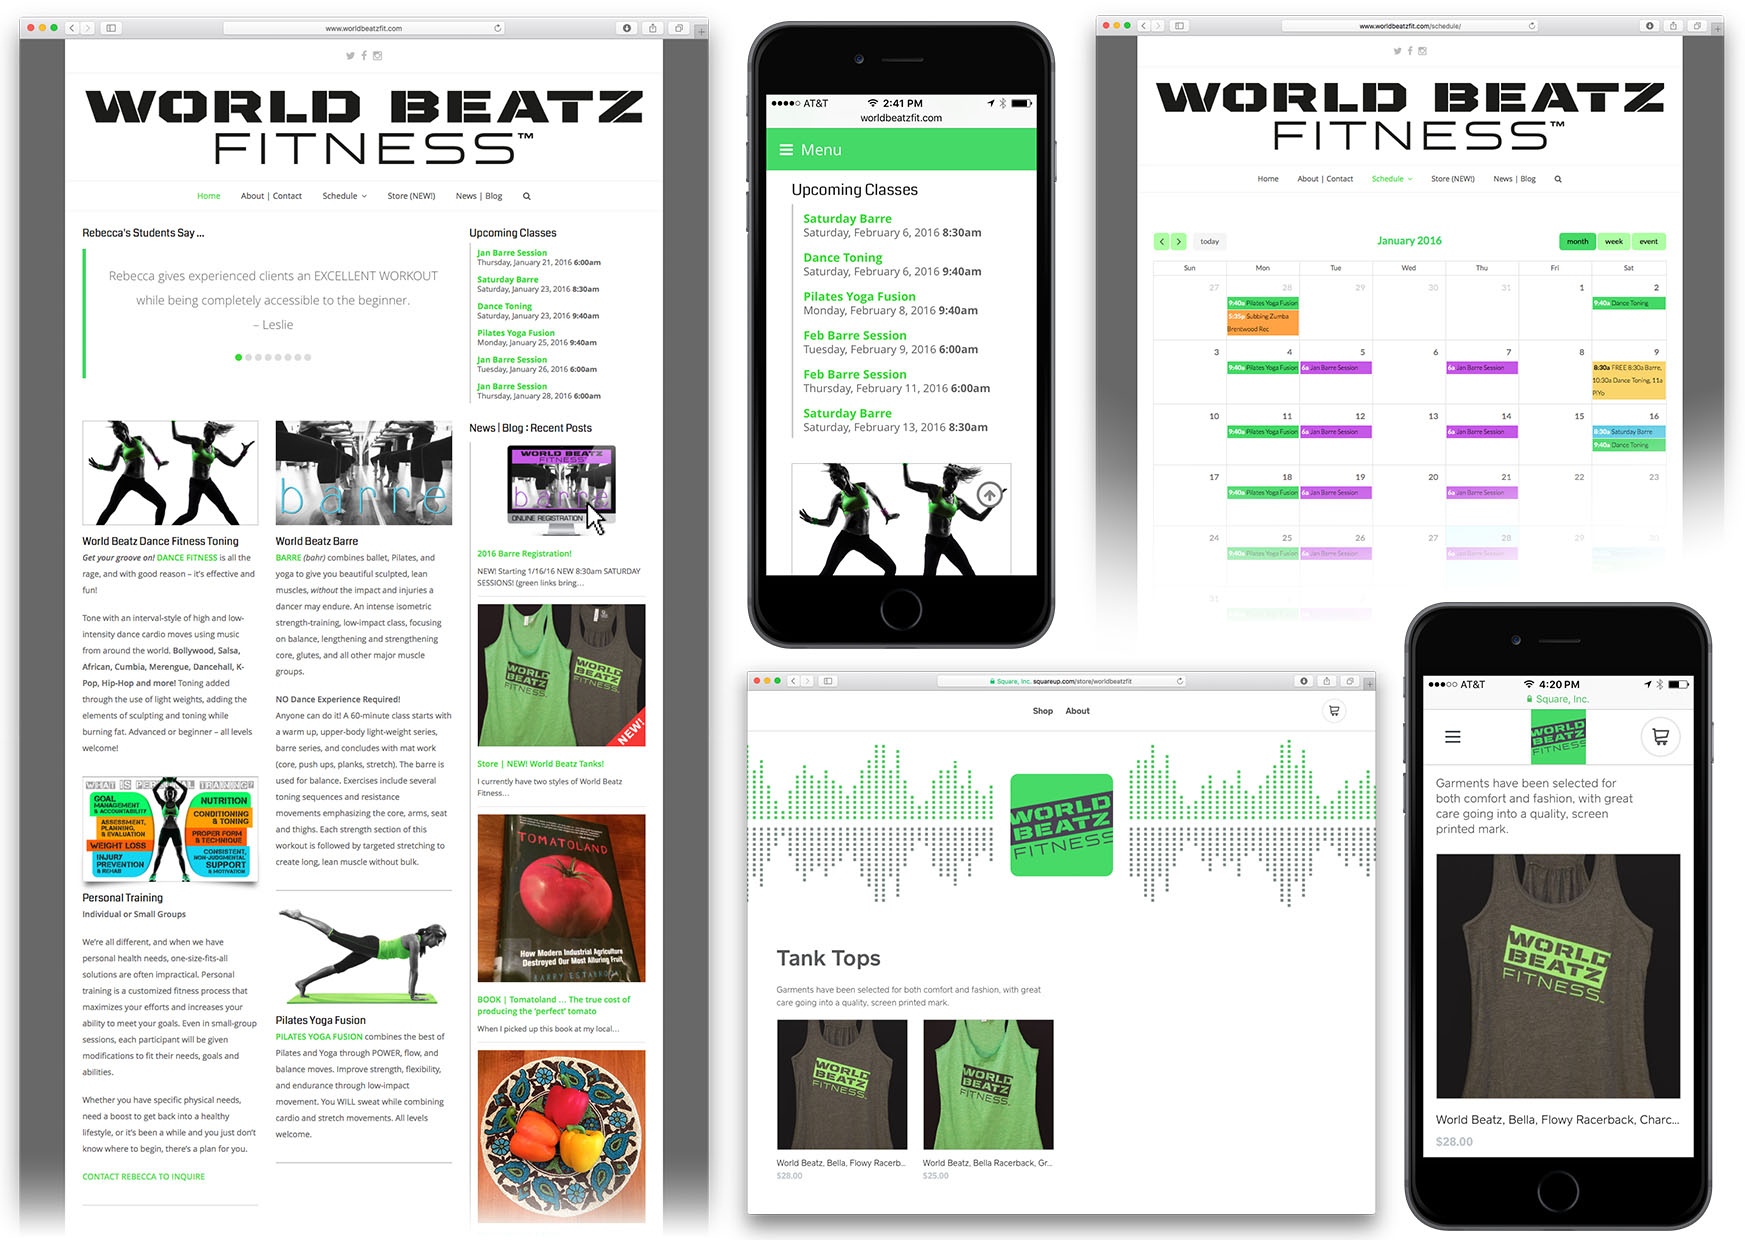 World Beatz Fitness Site